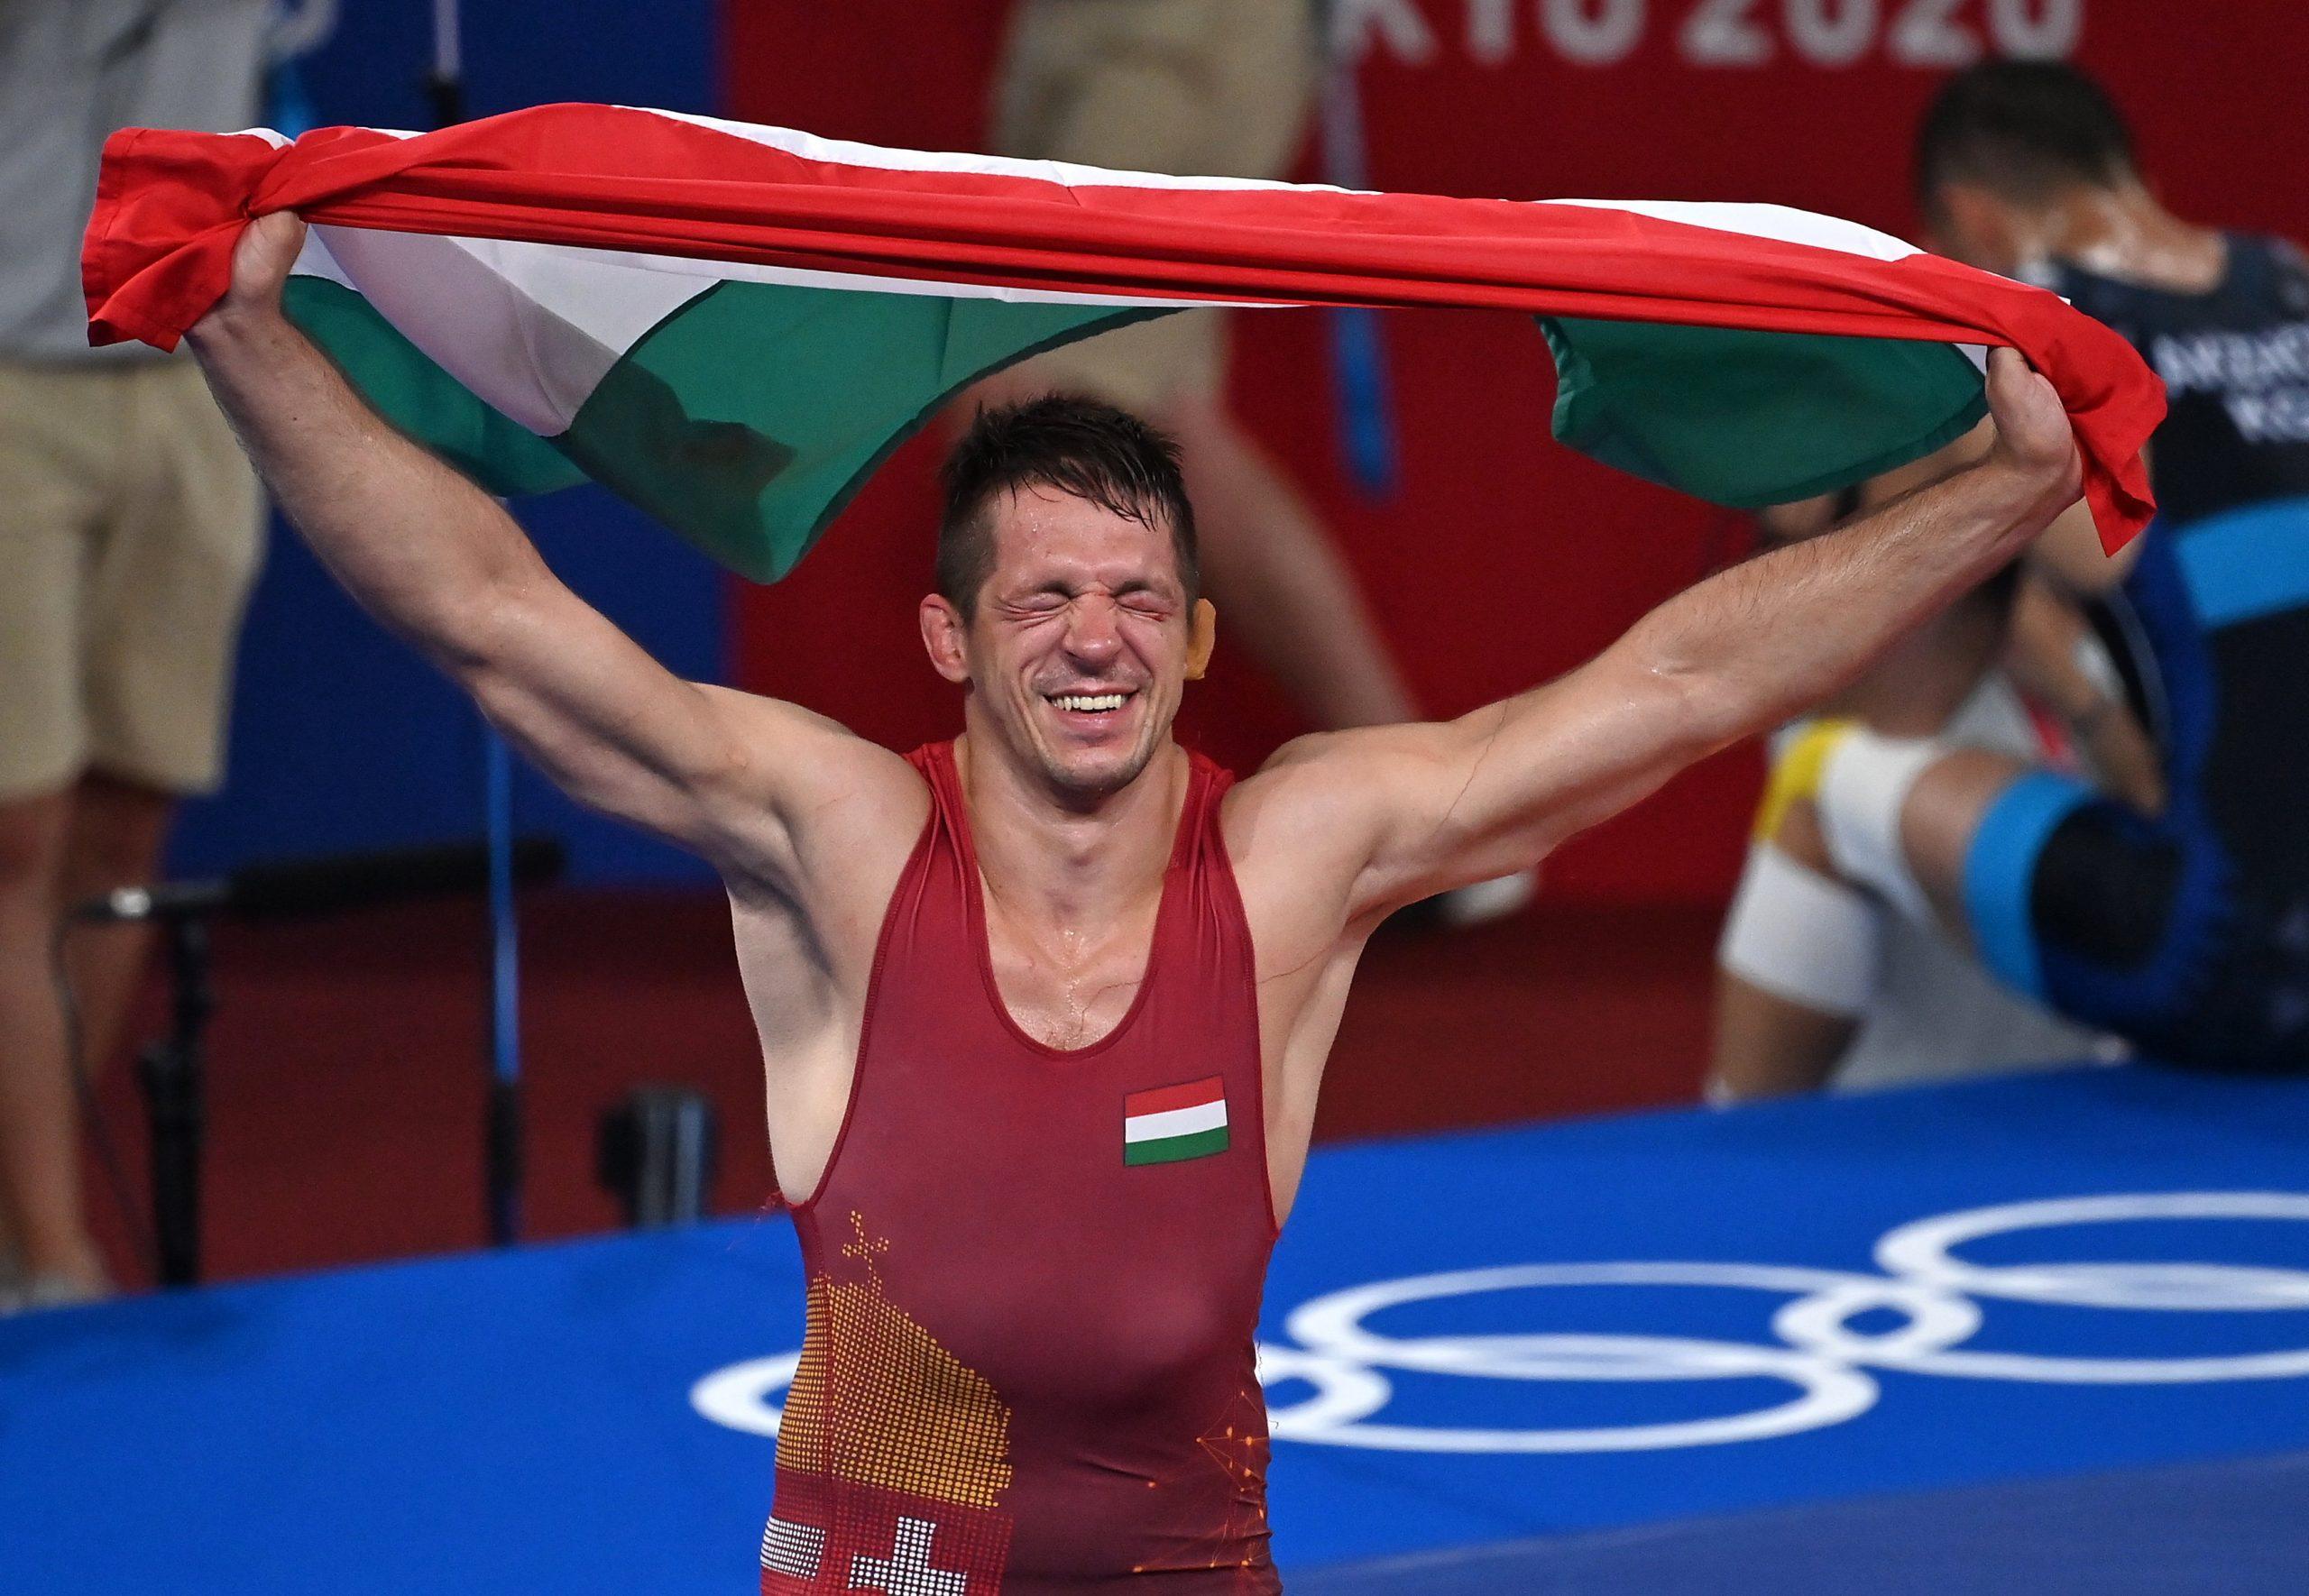 Tokio 2020: Tamás Lőrincz Olympiasieger im Ringen!